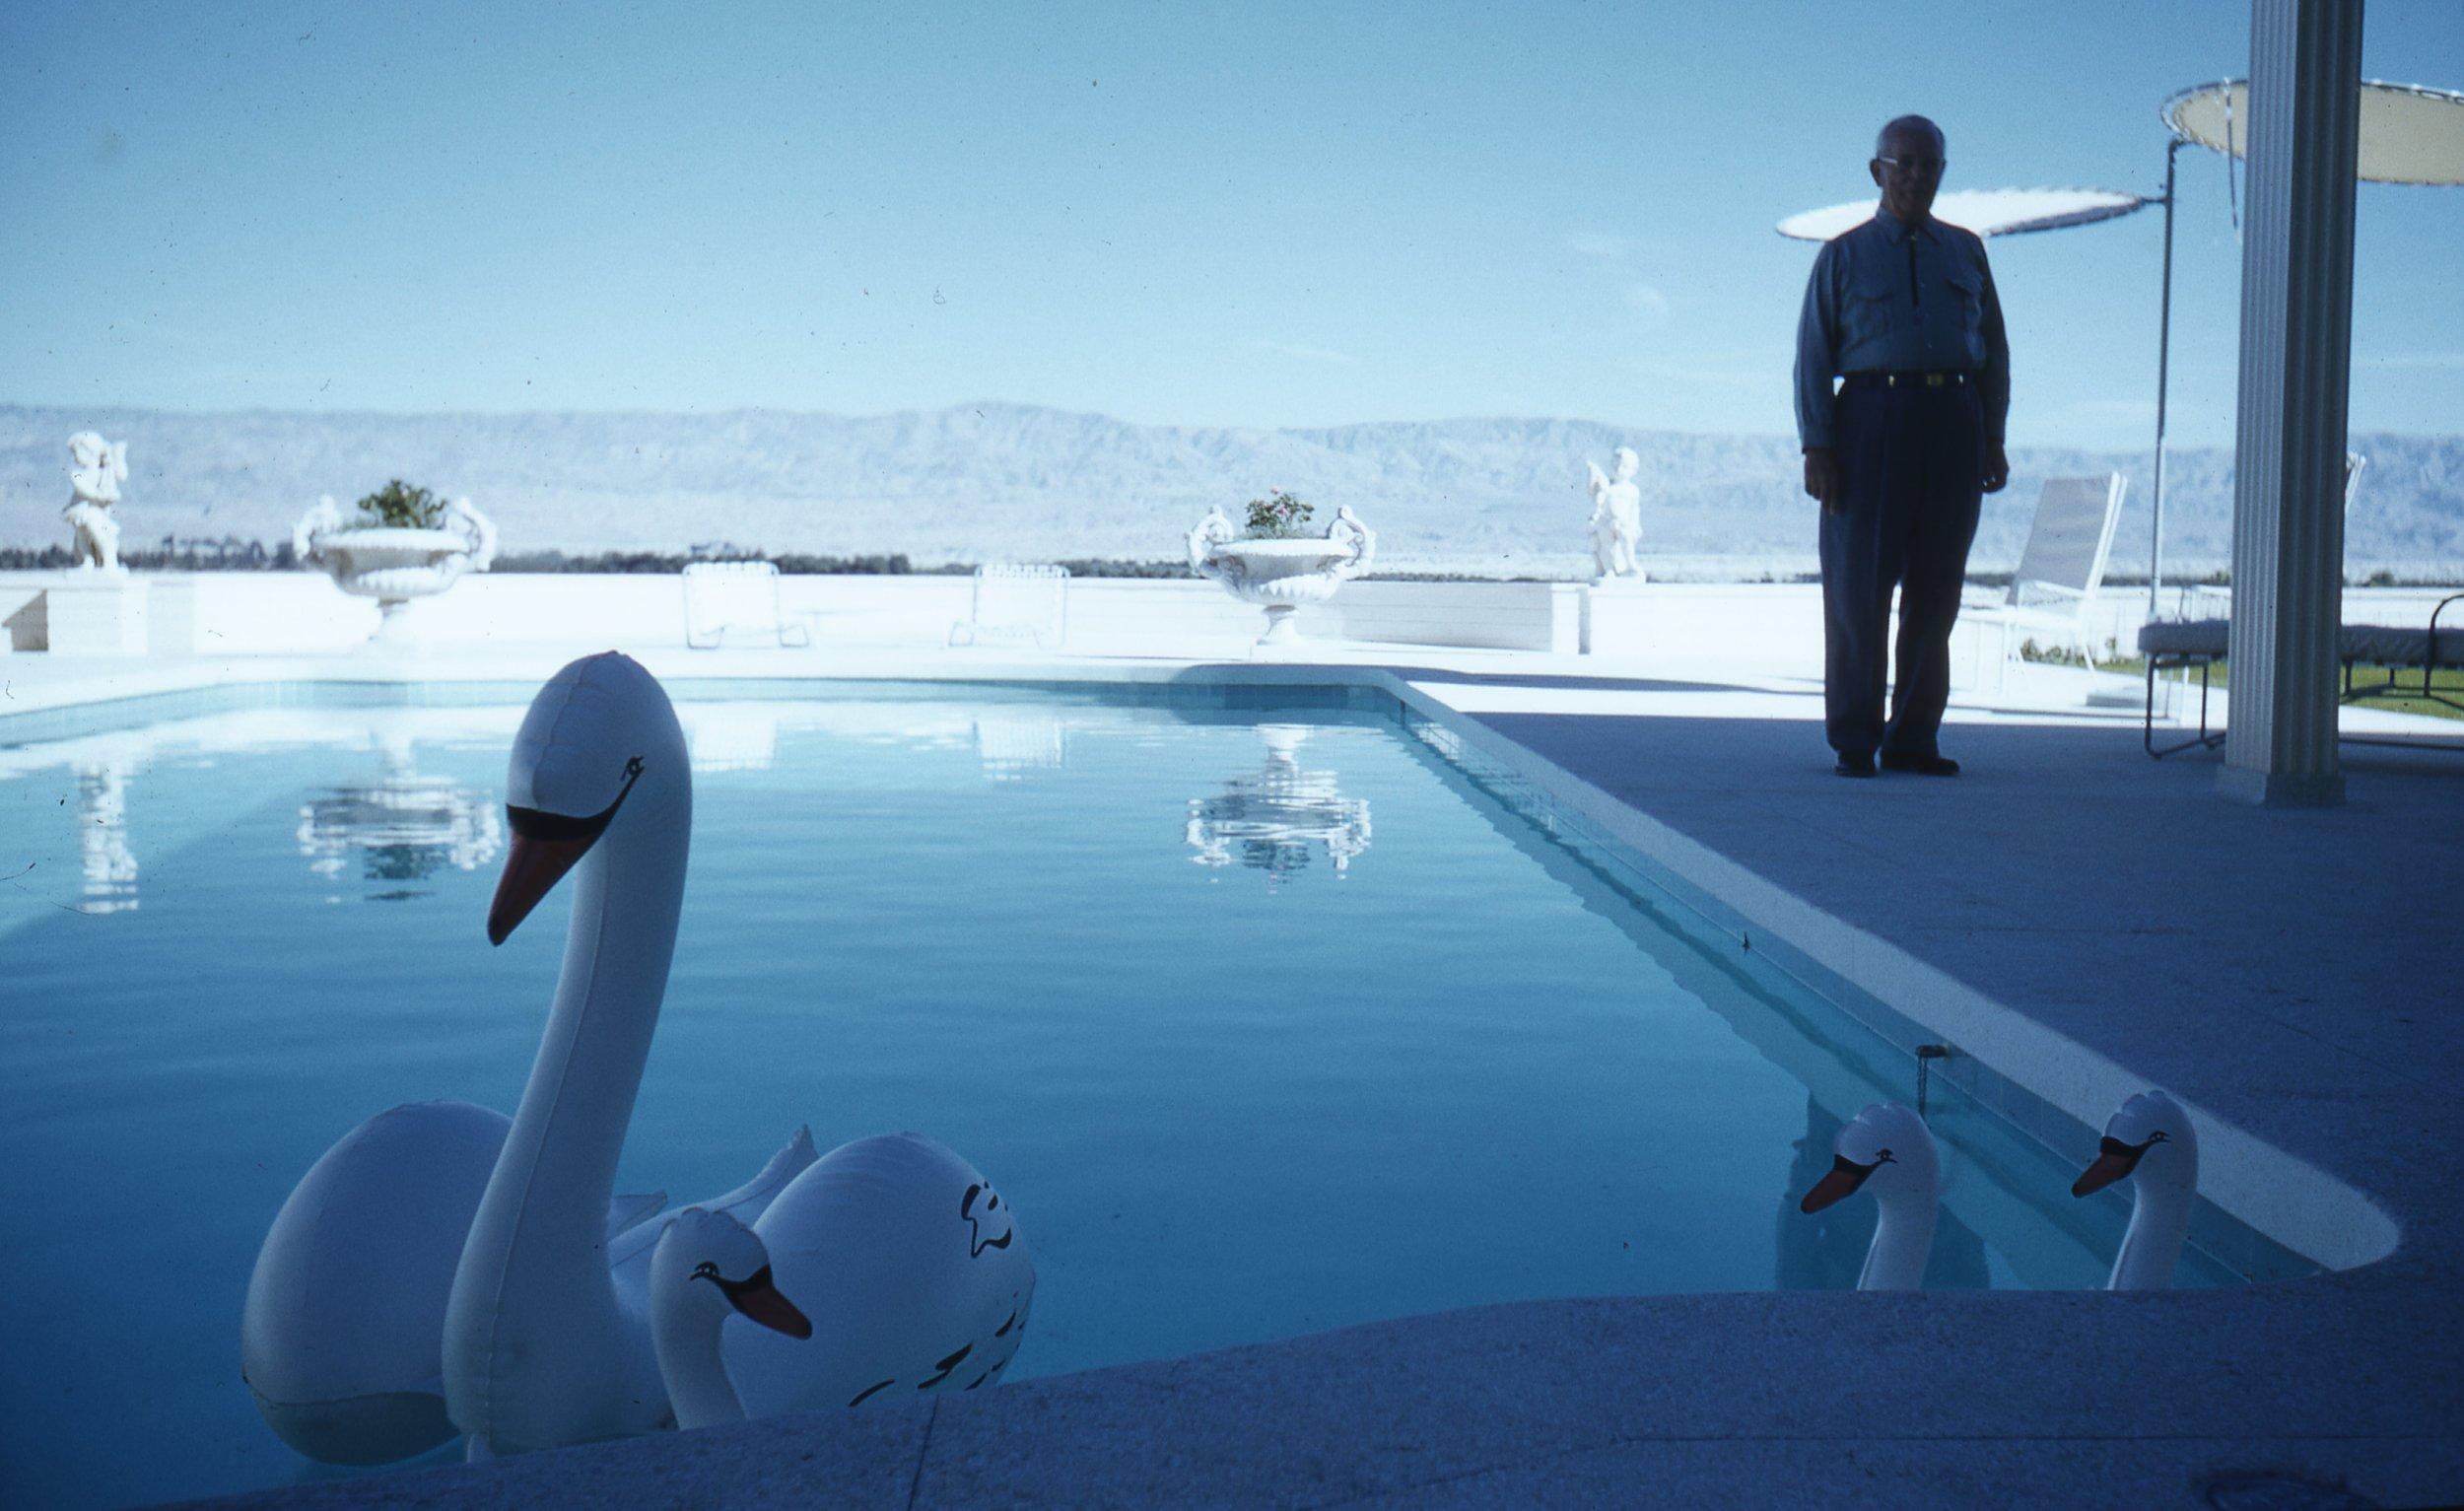 Robert Doisneau: Through the Lens - Read more